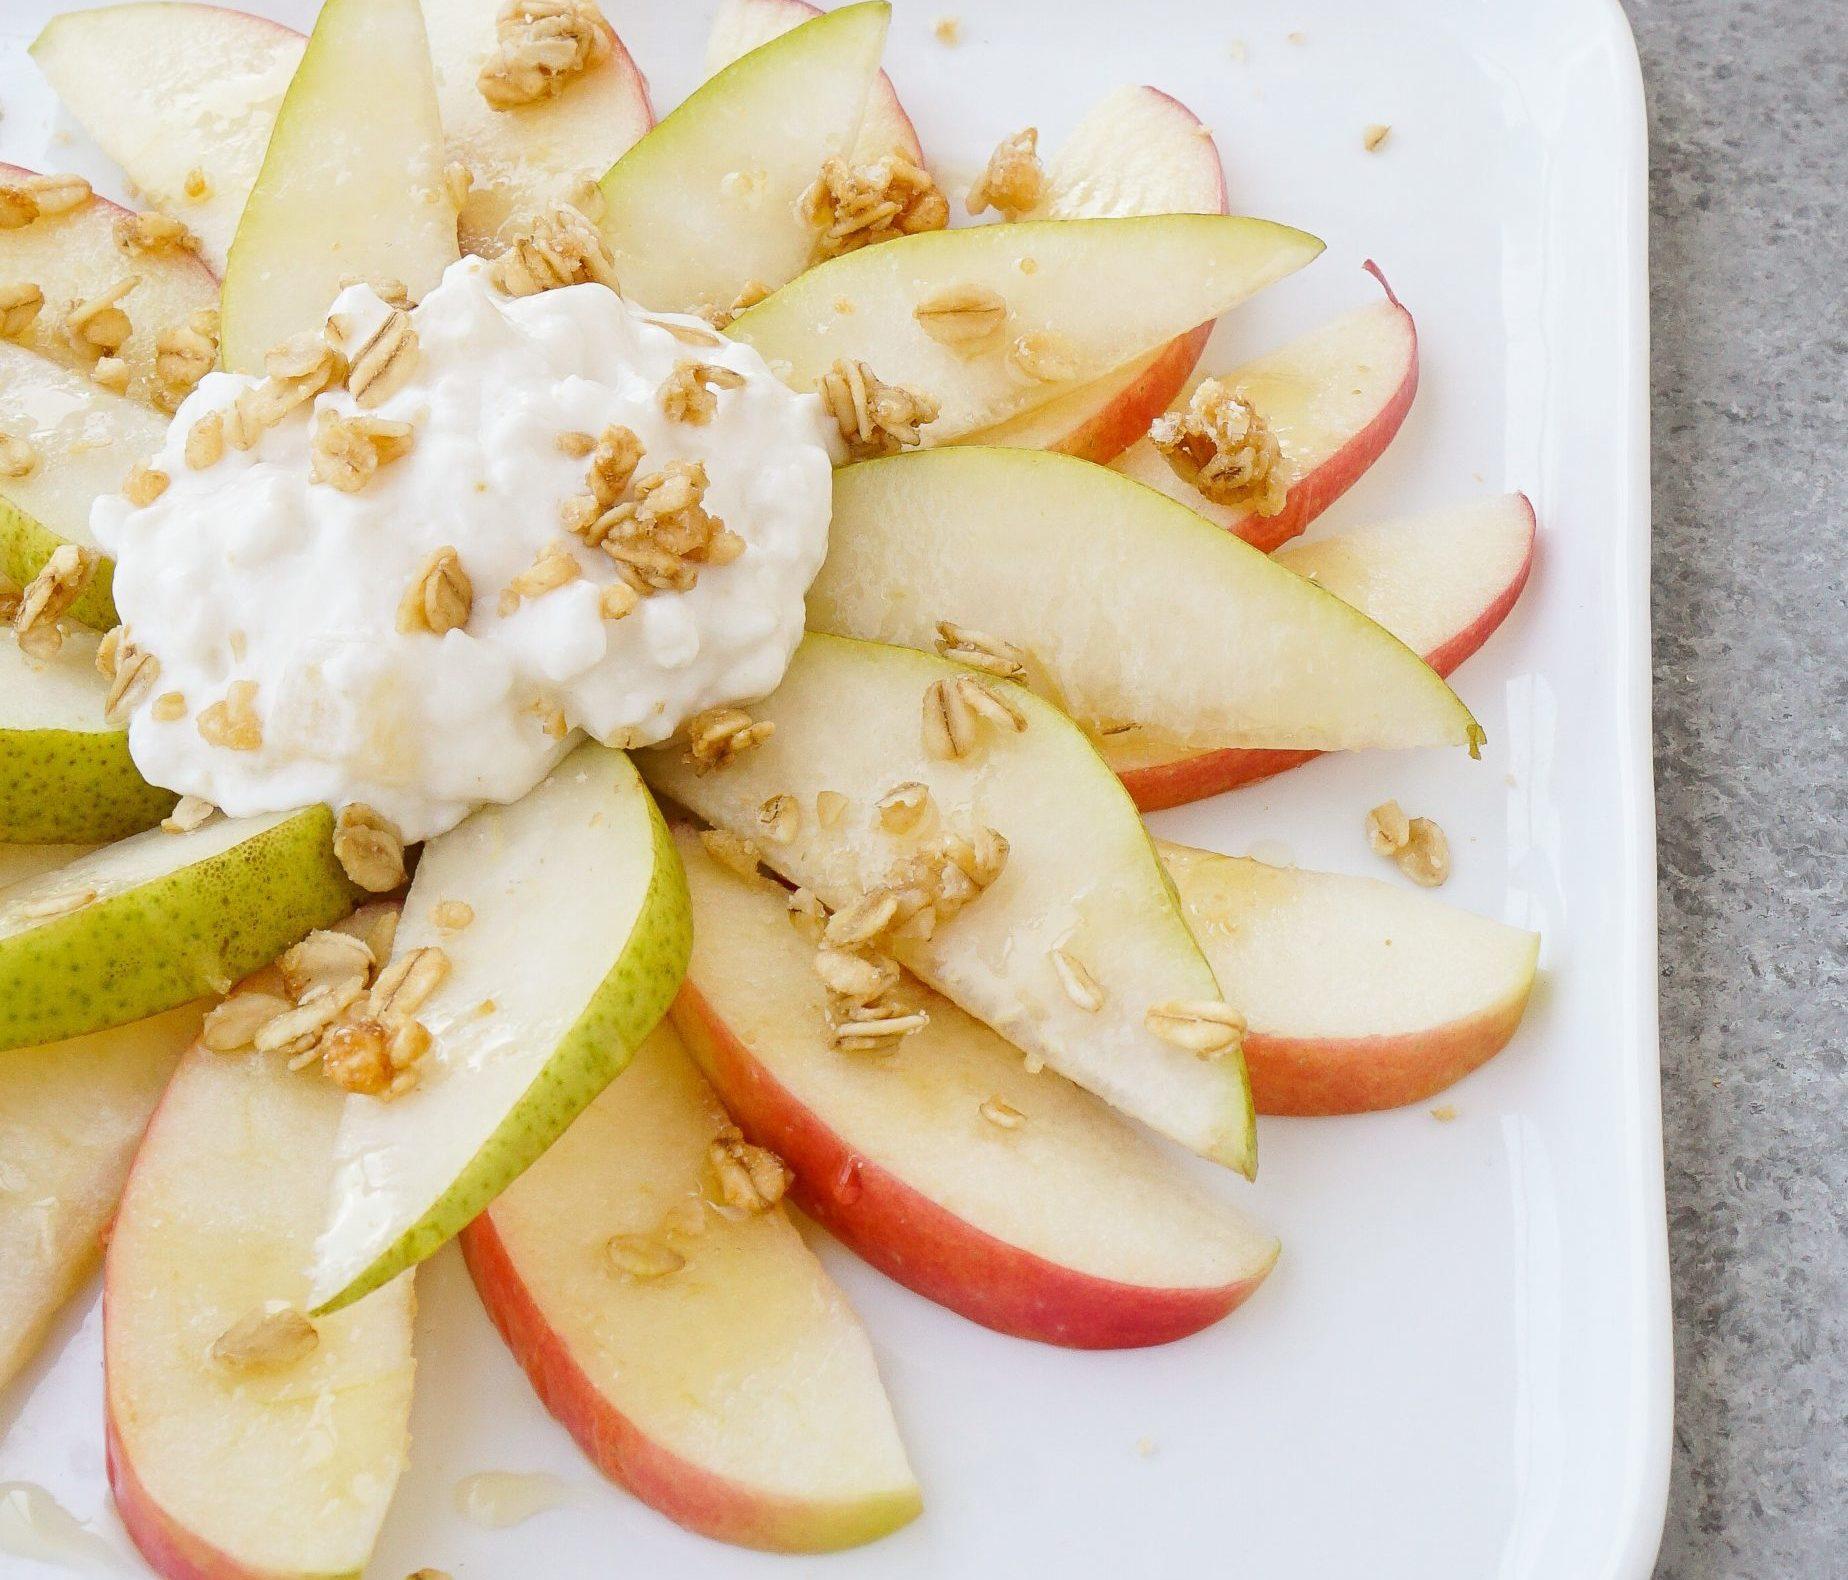 Hood Pear and Apple Nachos